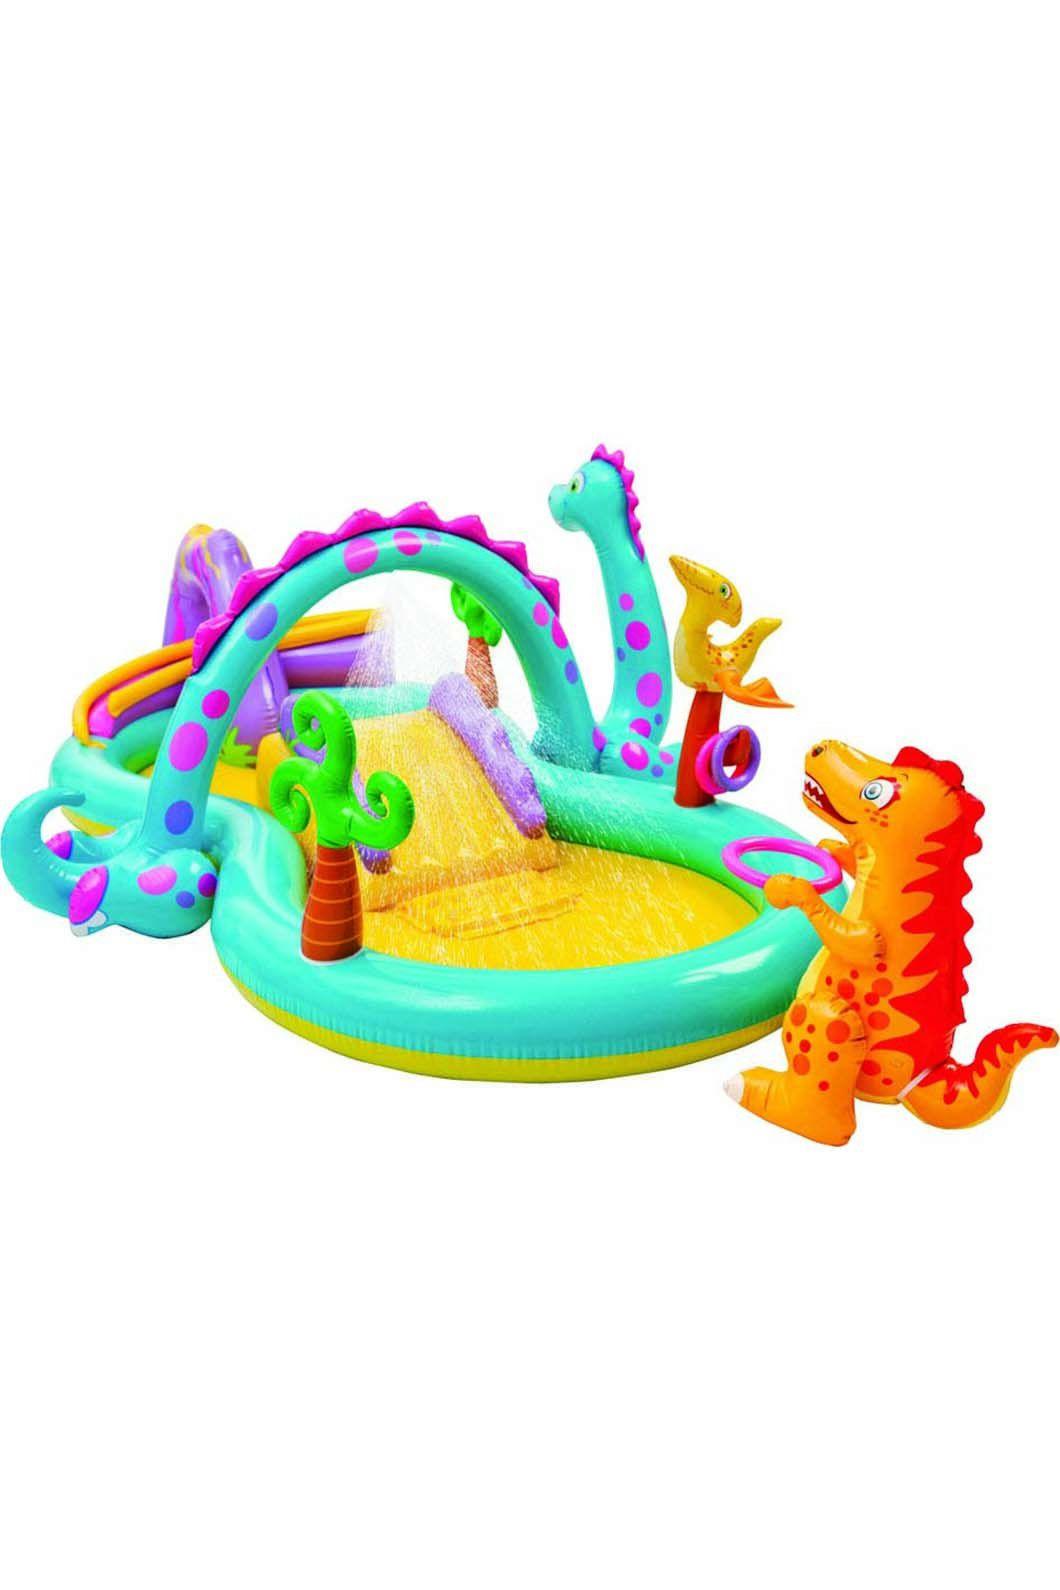 Intex Inflatable Dinoland Play Centre, None, hi-res